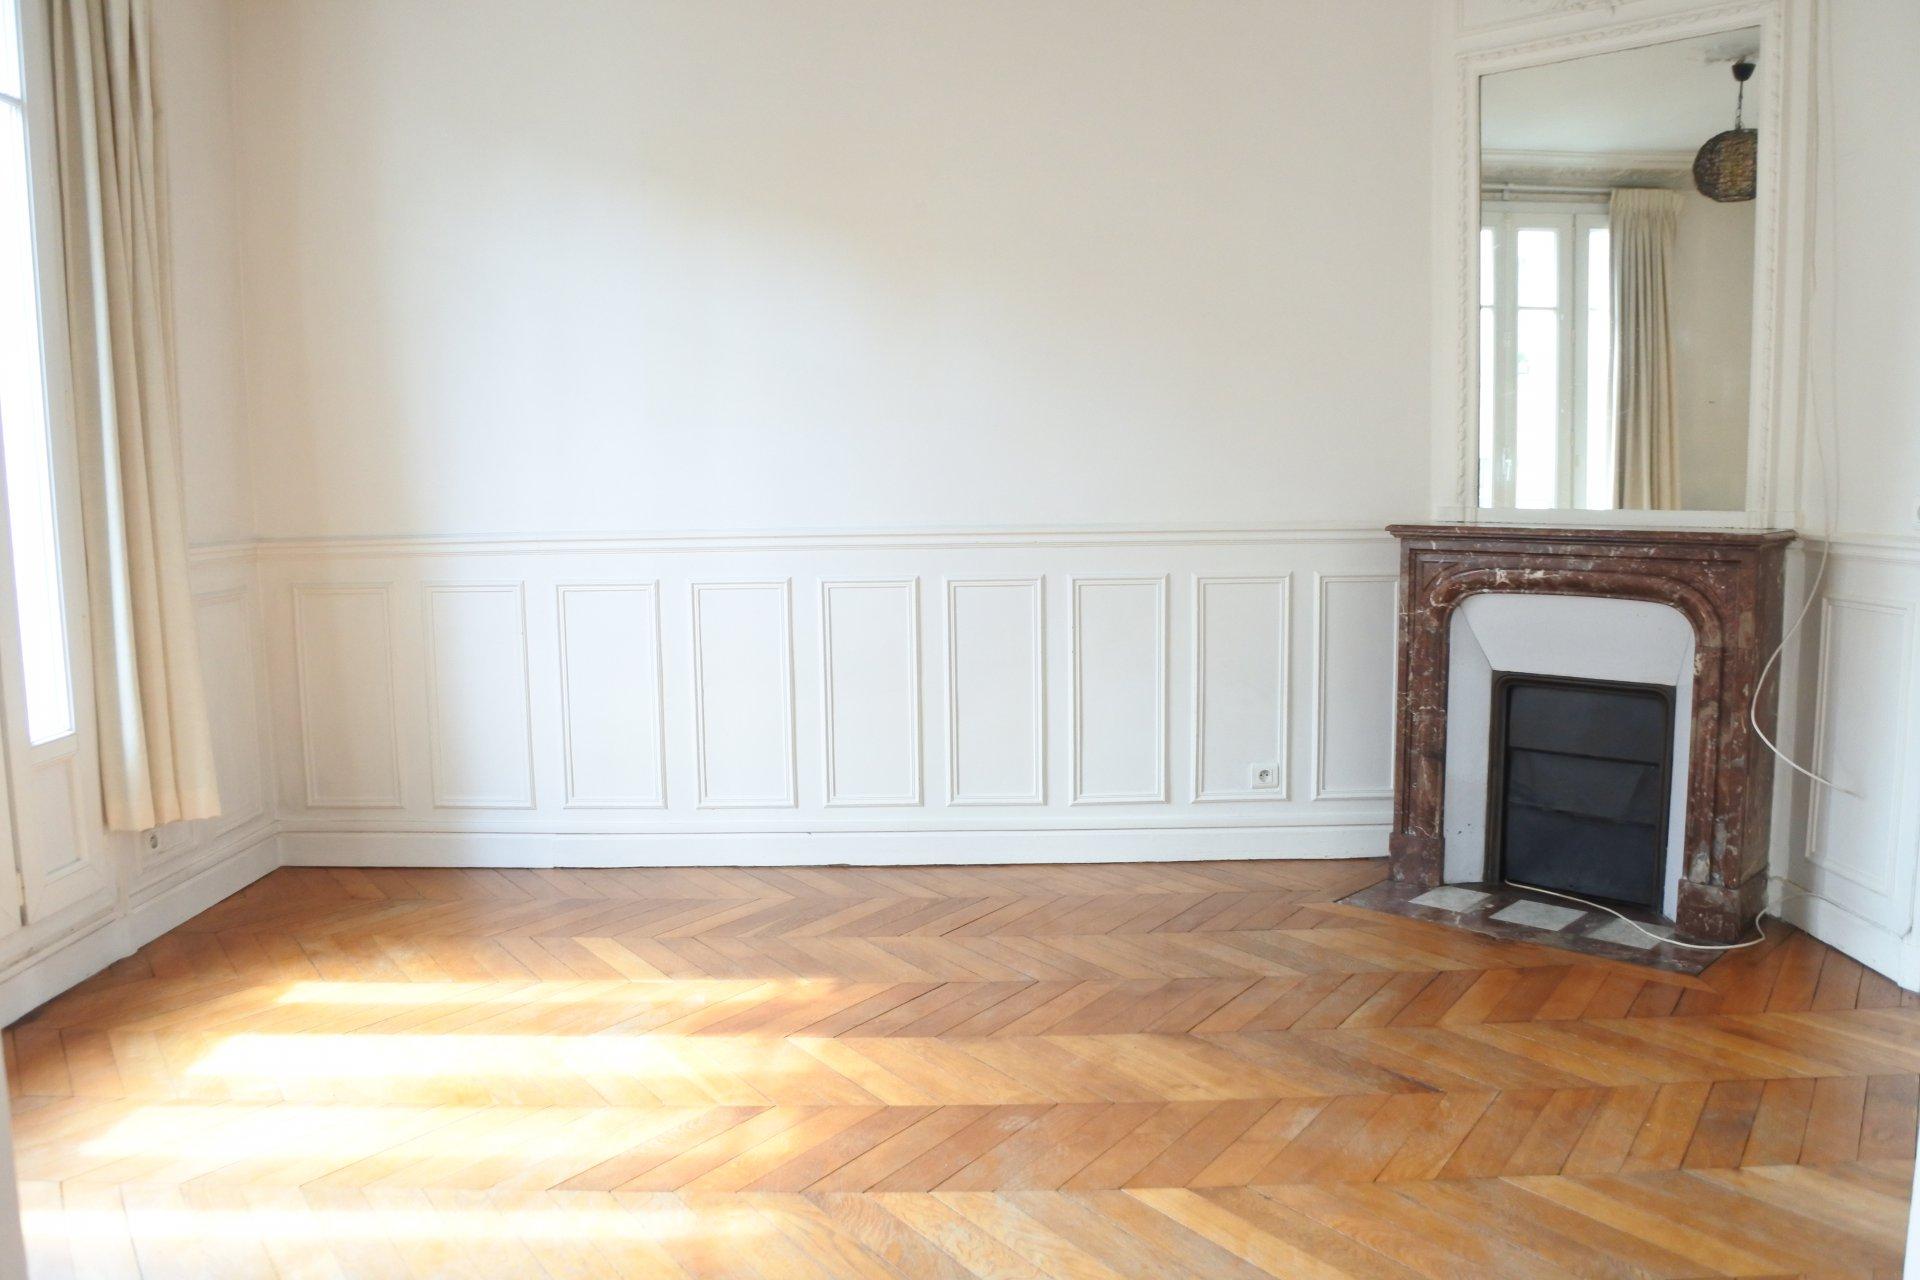 Location Appartement - Saint-Germain-en-Laye